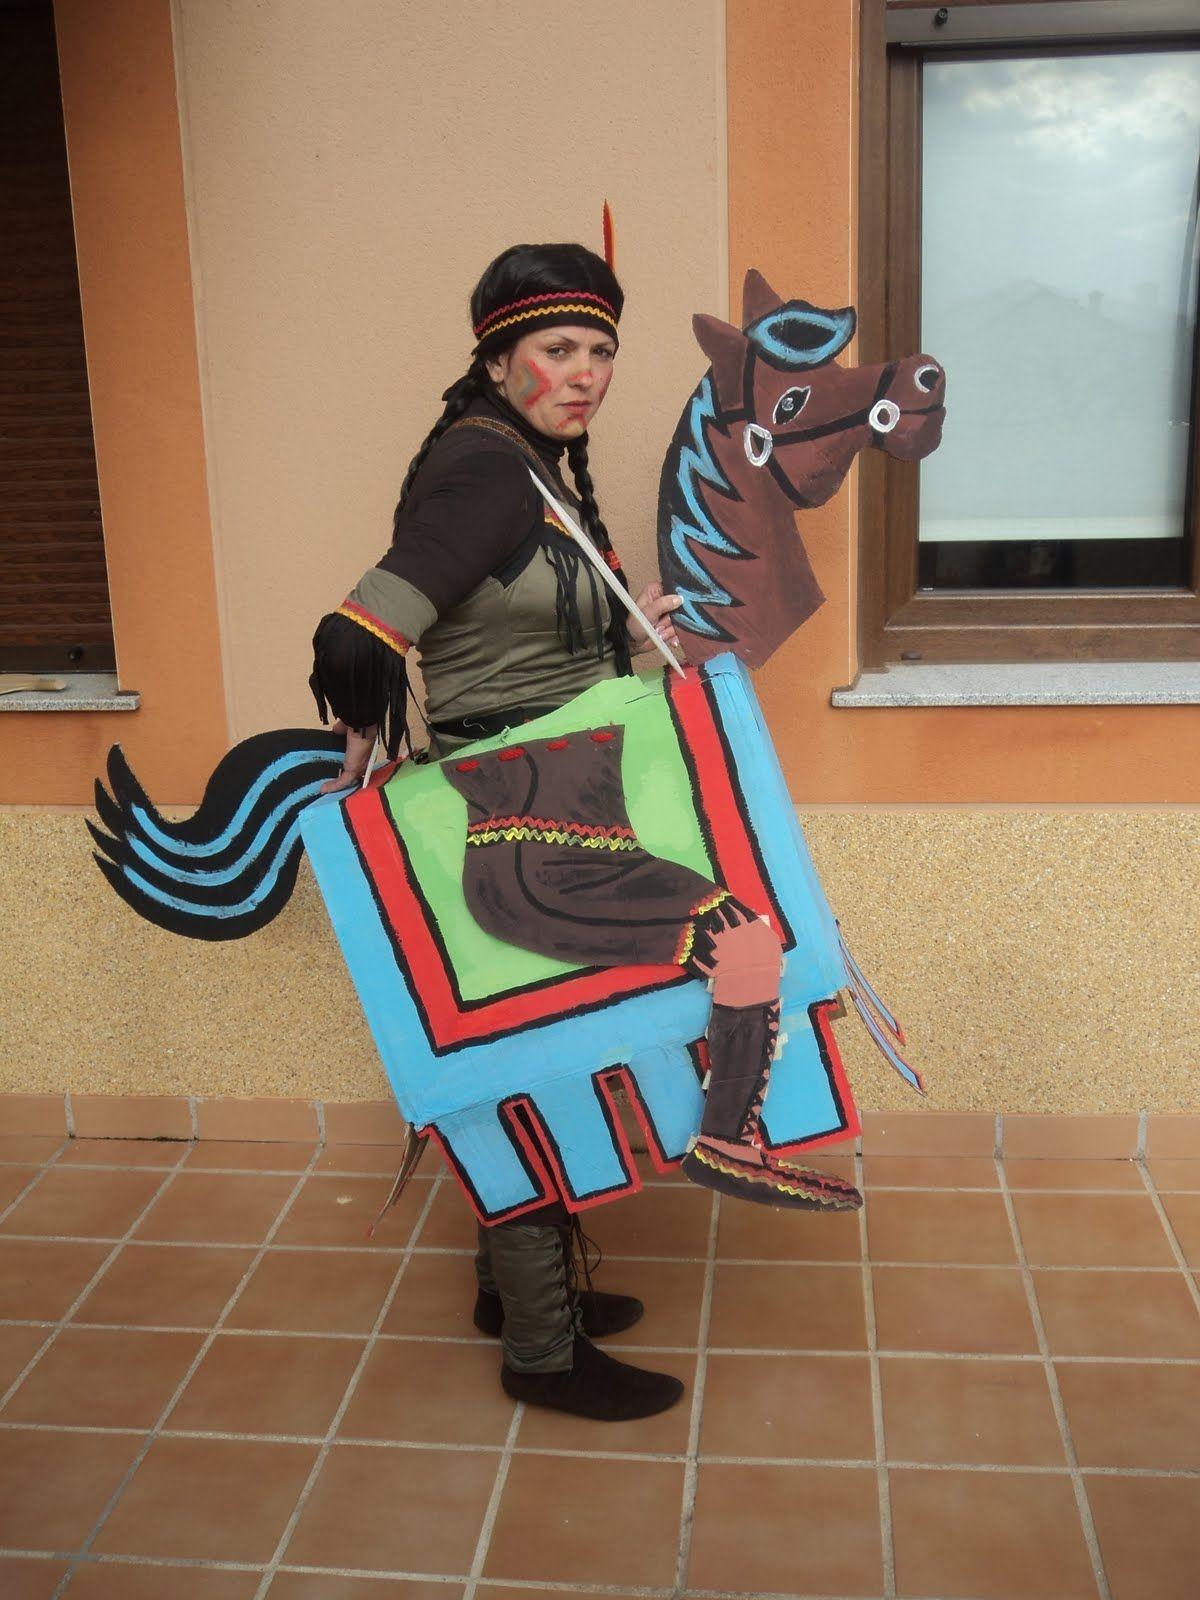 995c6403f disfraz de caballo casero - Buscar con Google | area de niños ...